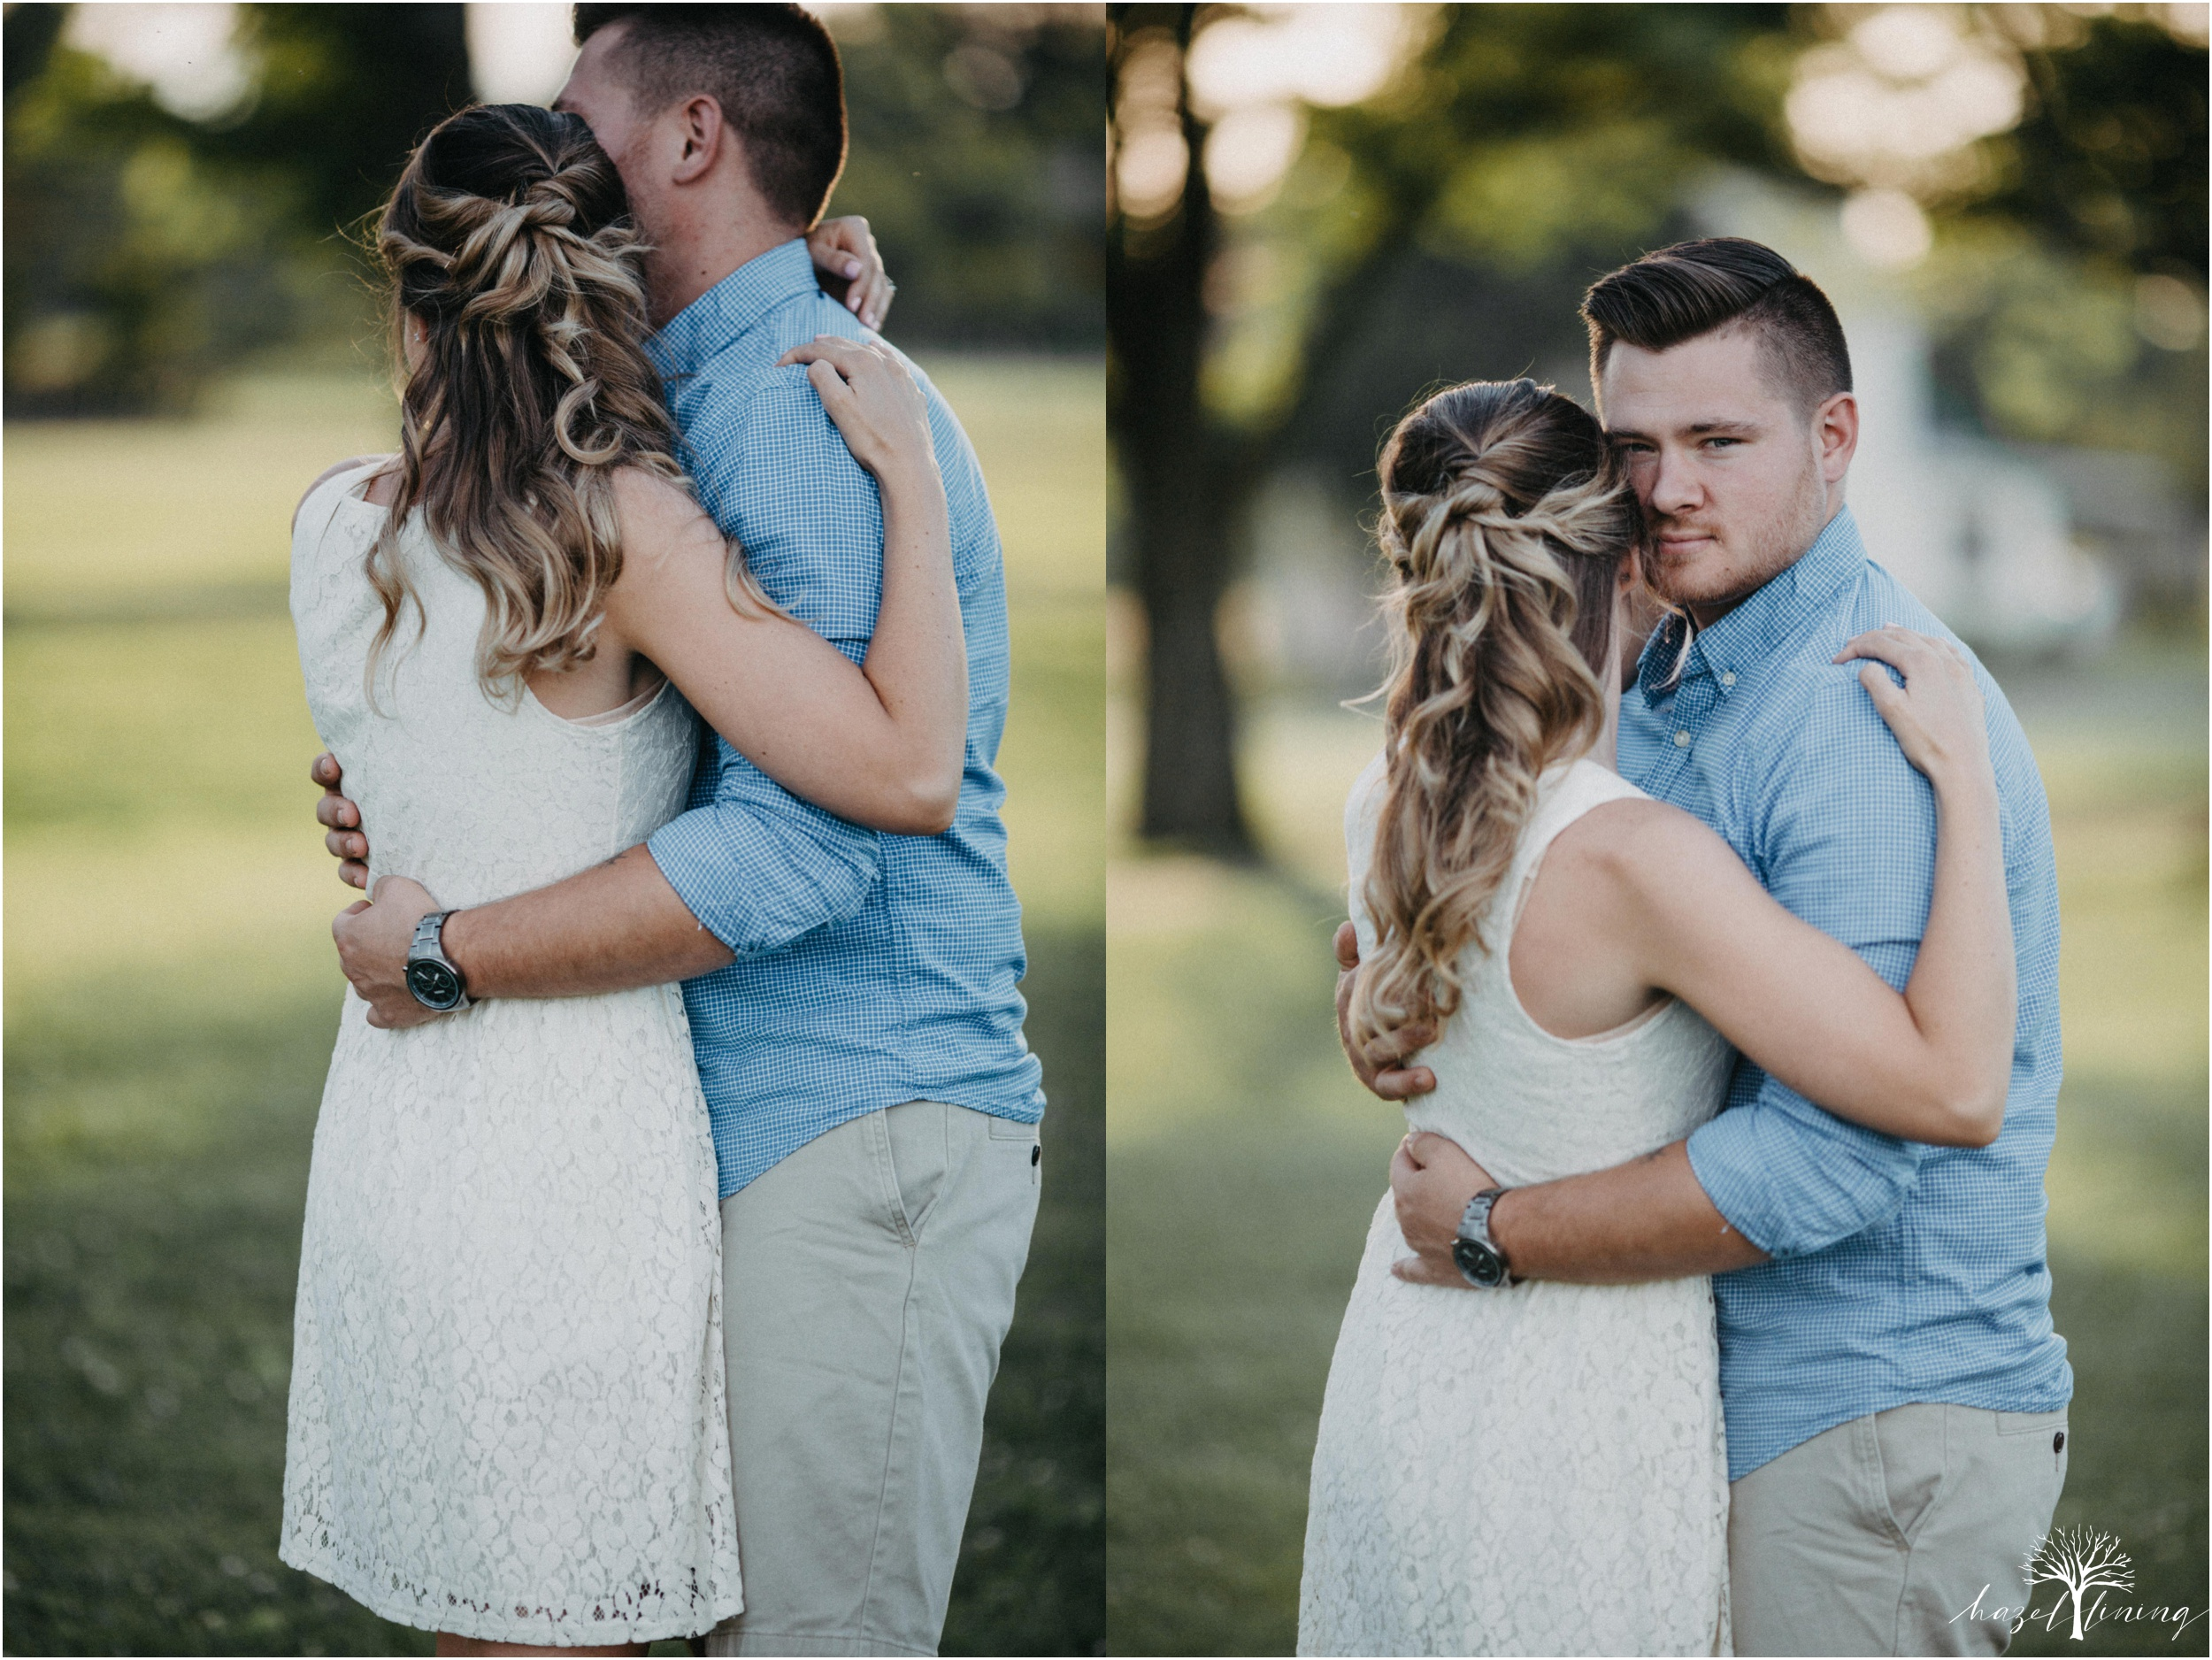 rachel-warner-chris-niedrist-the-farm-bakery-and-events-quakertown-pa-summer-engagement-hazel-lining-photography-destination-elopement-wedding-engagement-photography_0014.jpg